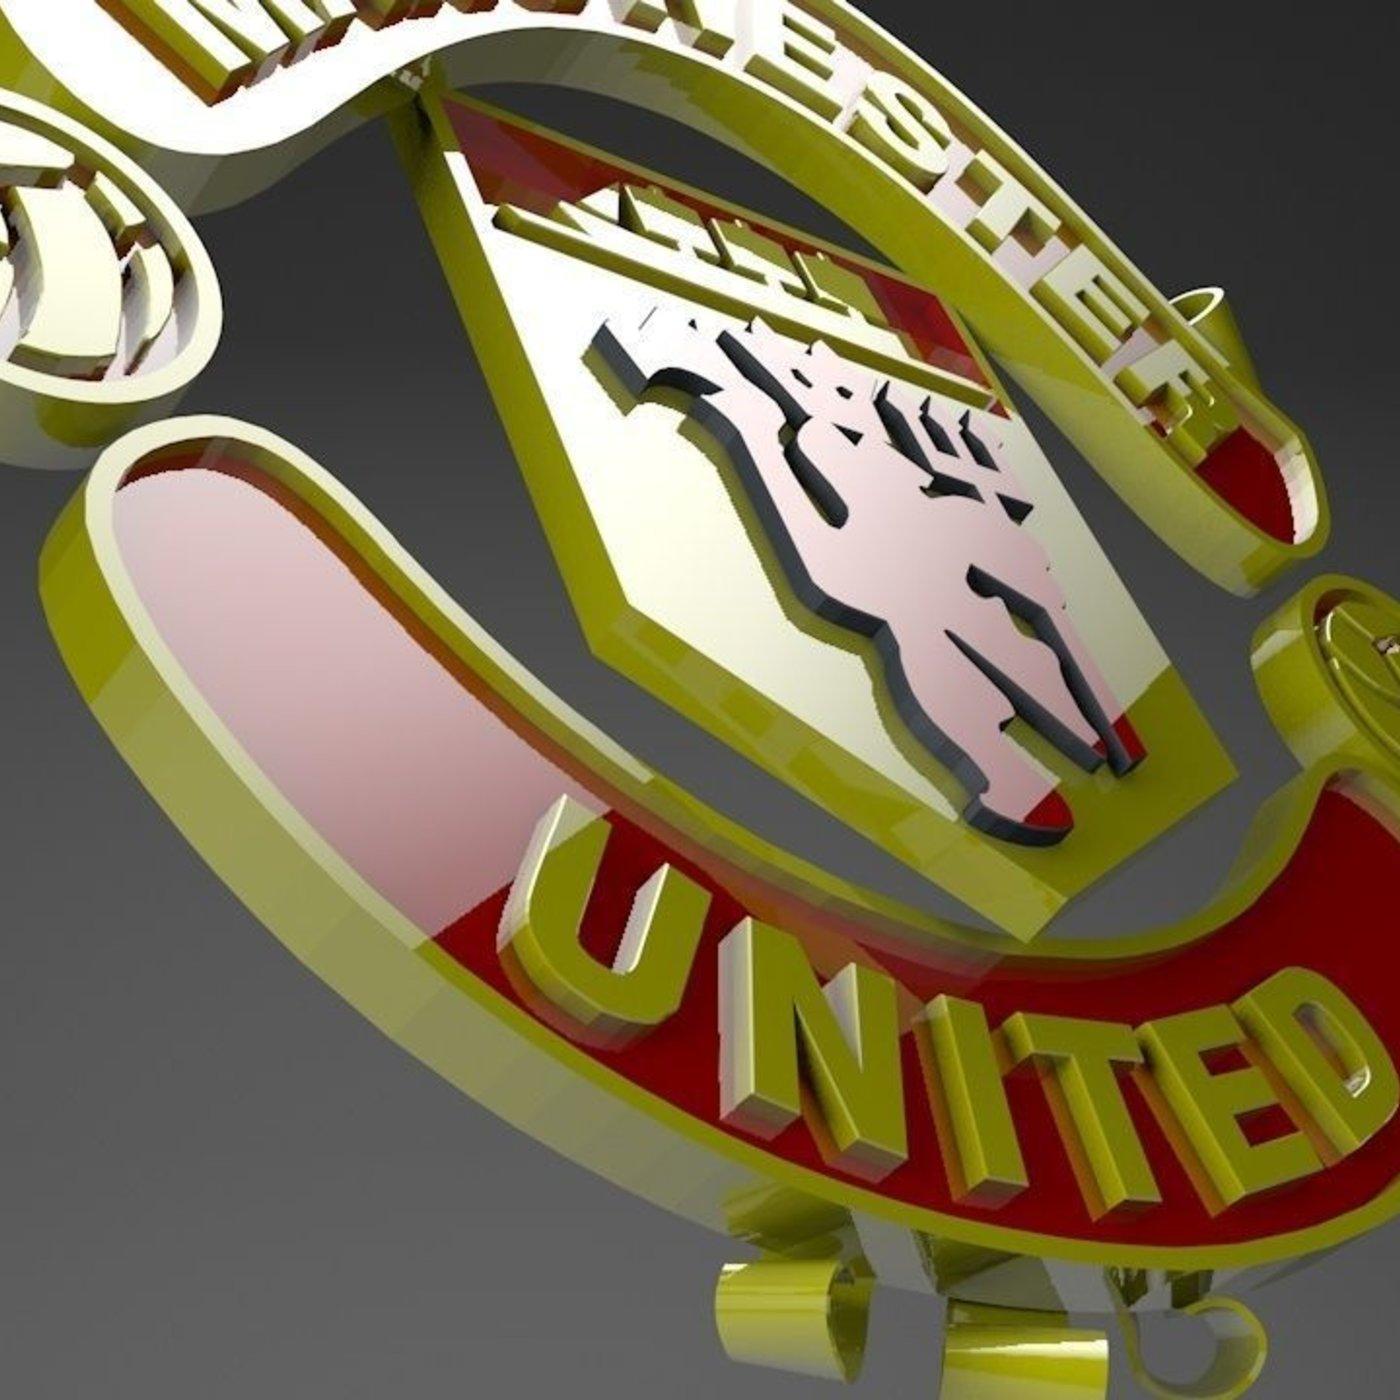 manchester united logo cgtrader manchester united logo cgtrader